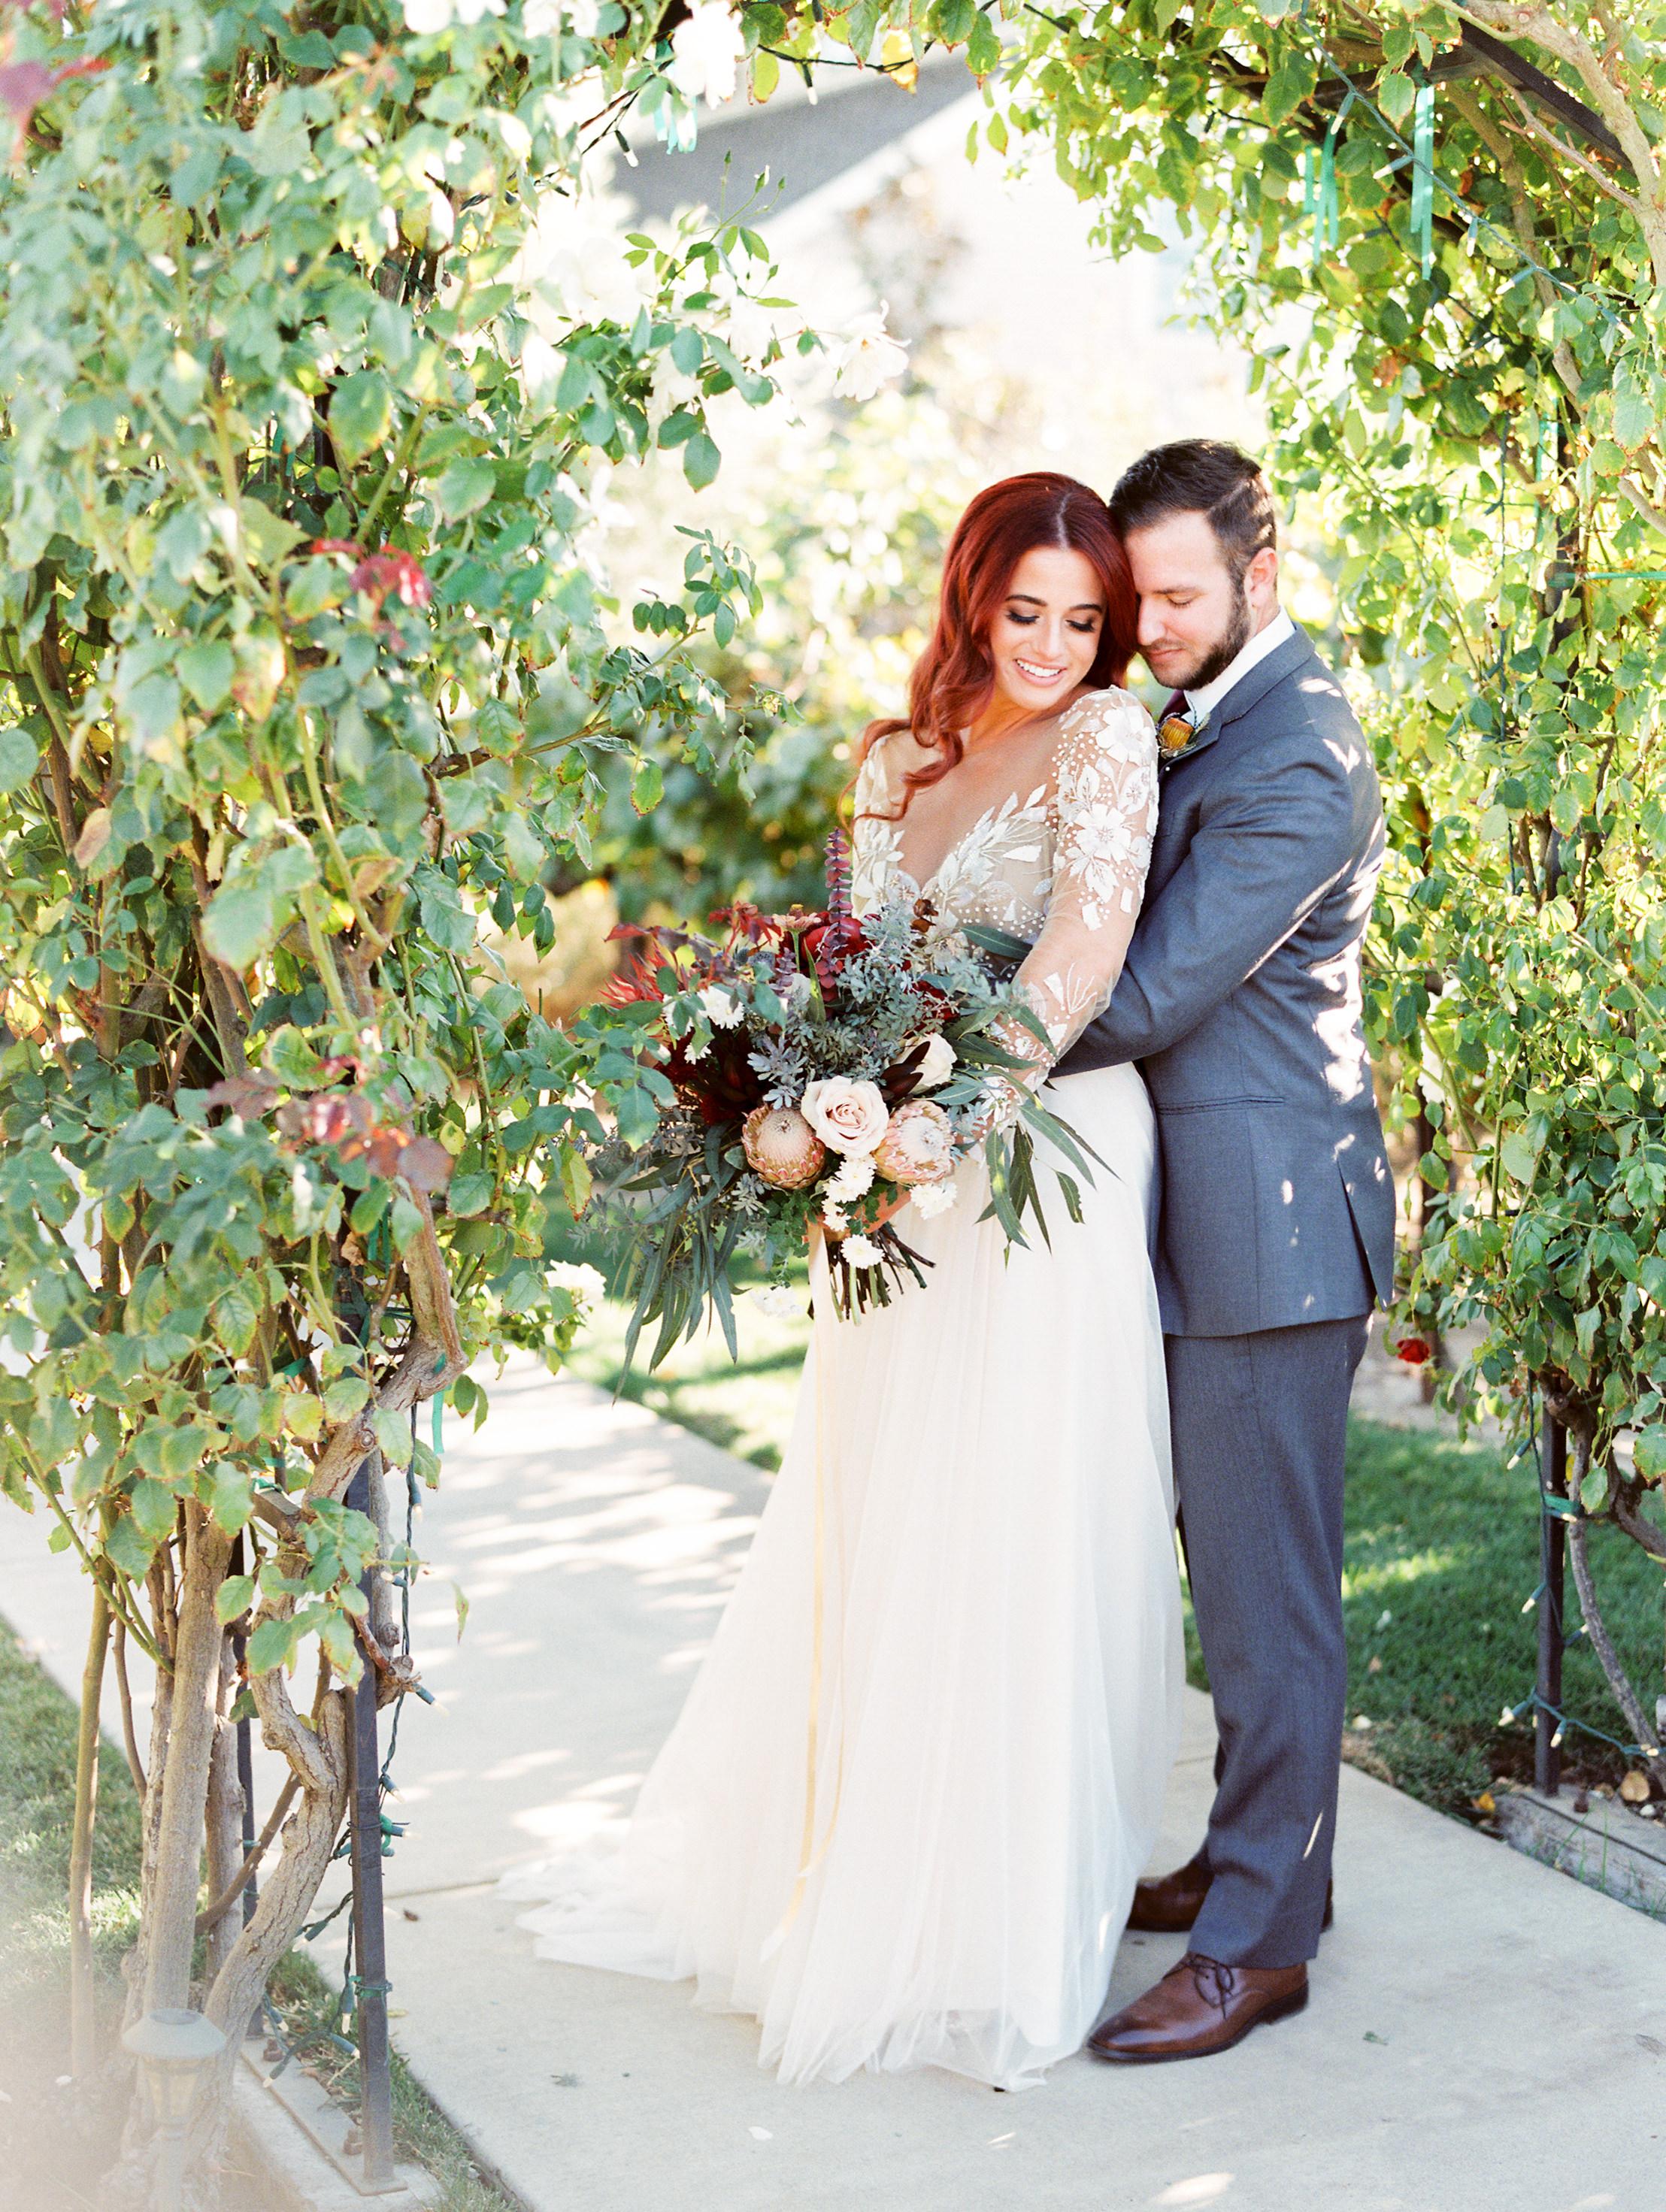 fall-inspired-wedding-at-scribner-bend-vineyards-in-sacramento-california-1-7.jpg